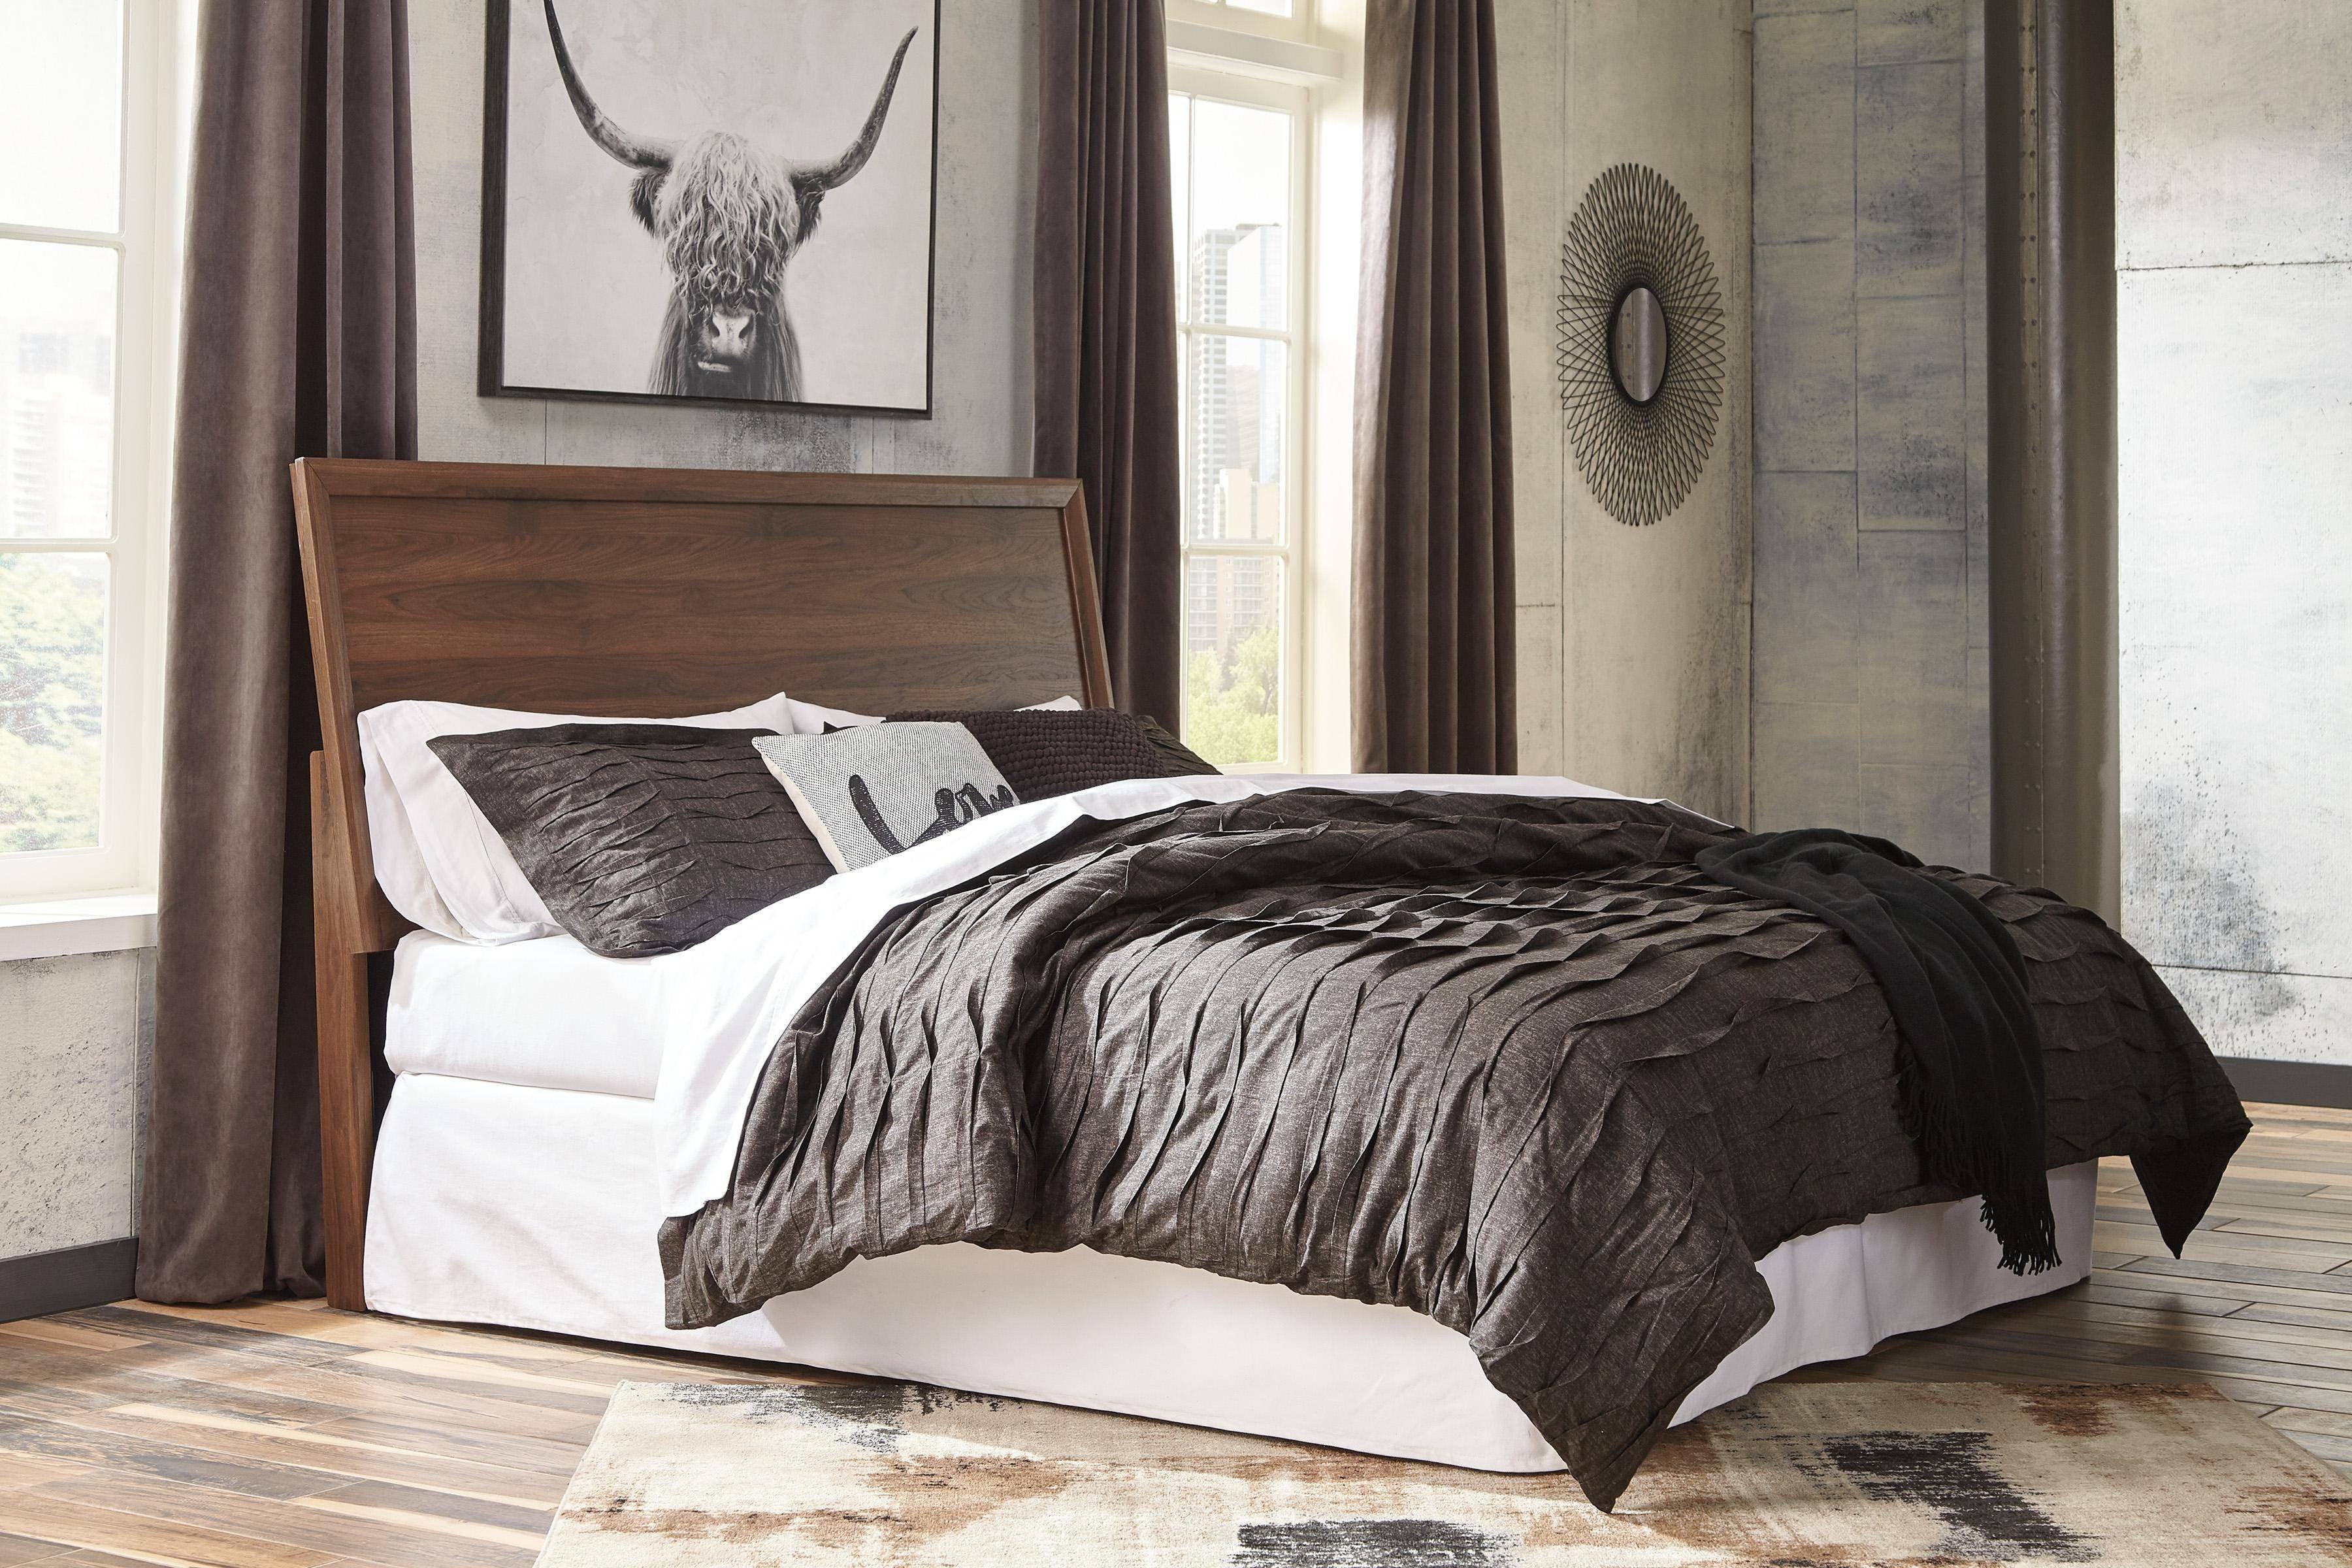 Ashley Home Store Bedroom Set Fresh ashley Daneston B292 King Size Panel Bedroom Set 6pcs In